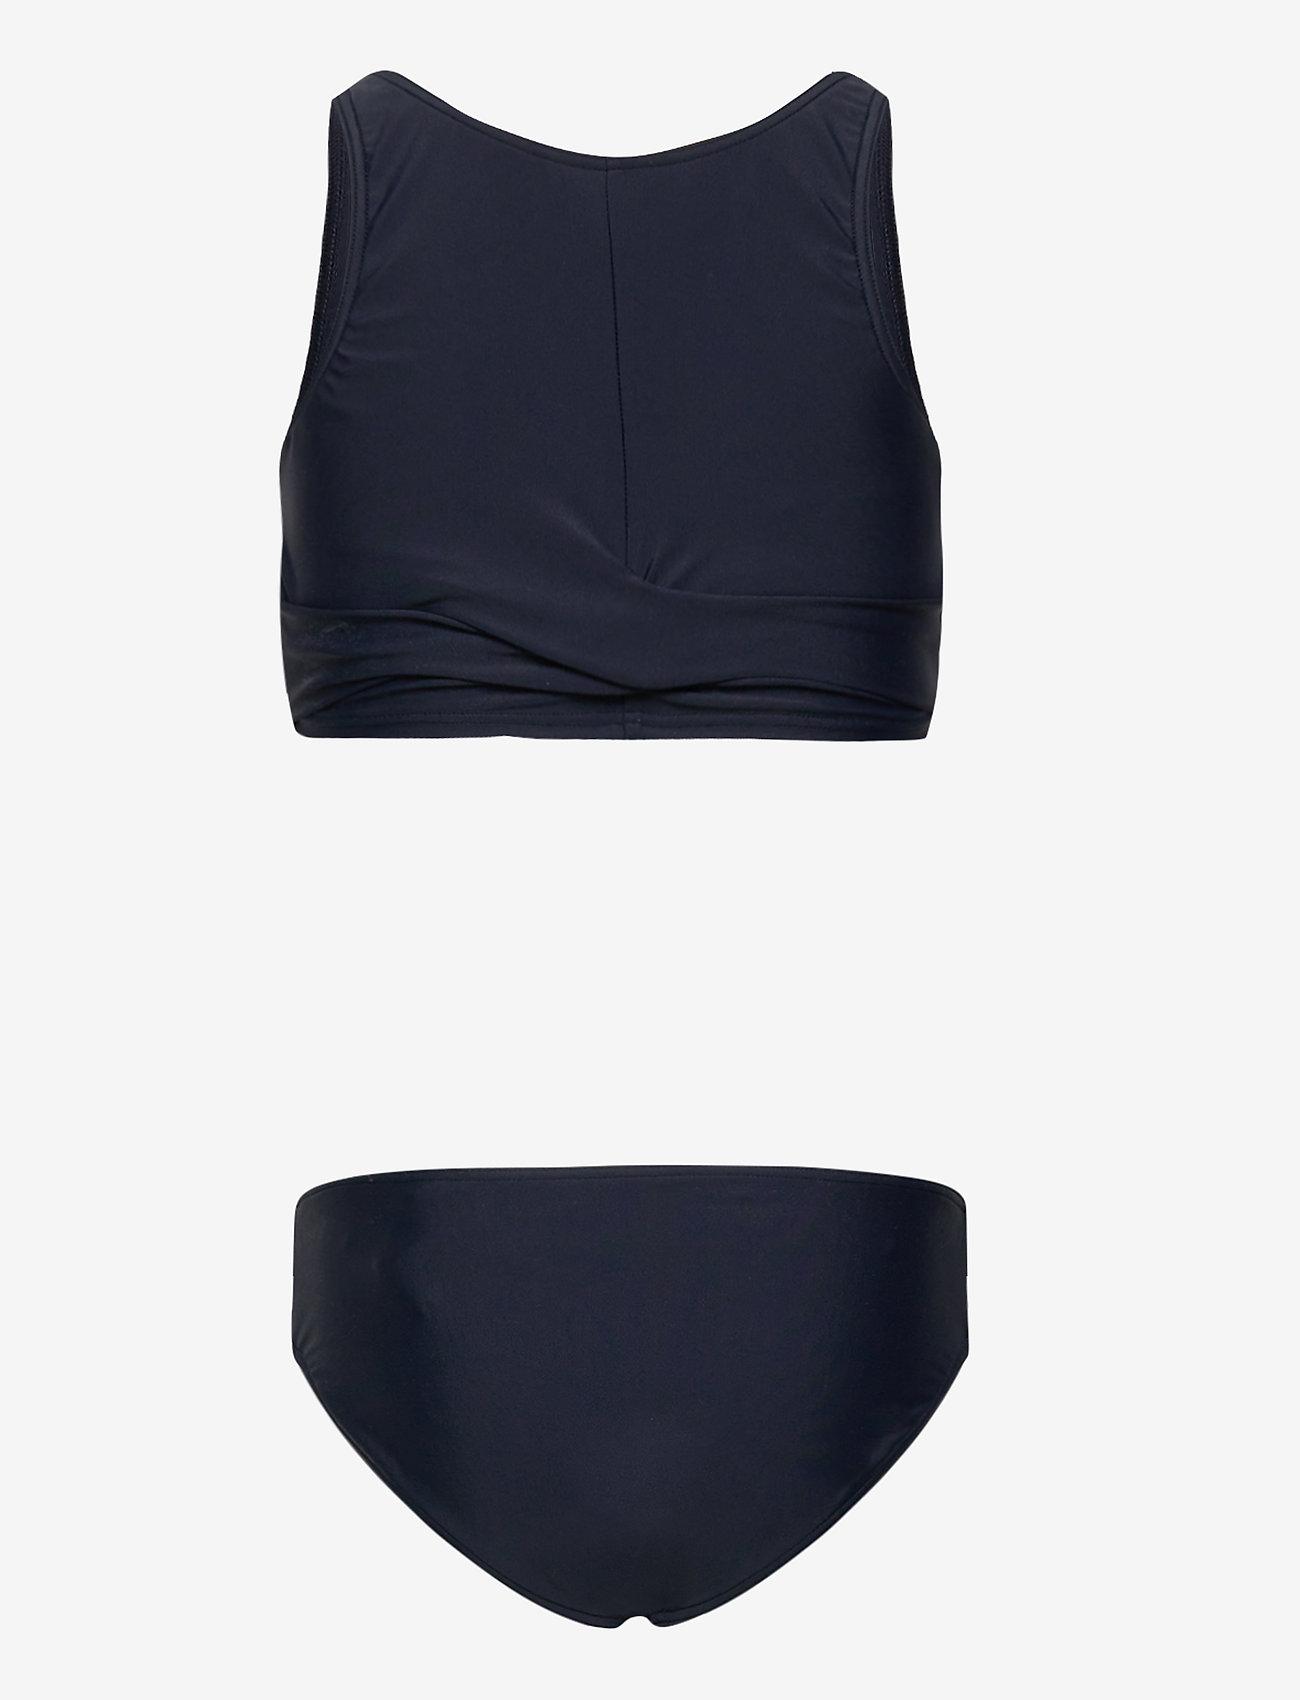 Abercrombie & Fitch - kids GIRLS SWIM - swimsuits - navy - 1